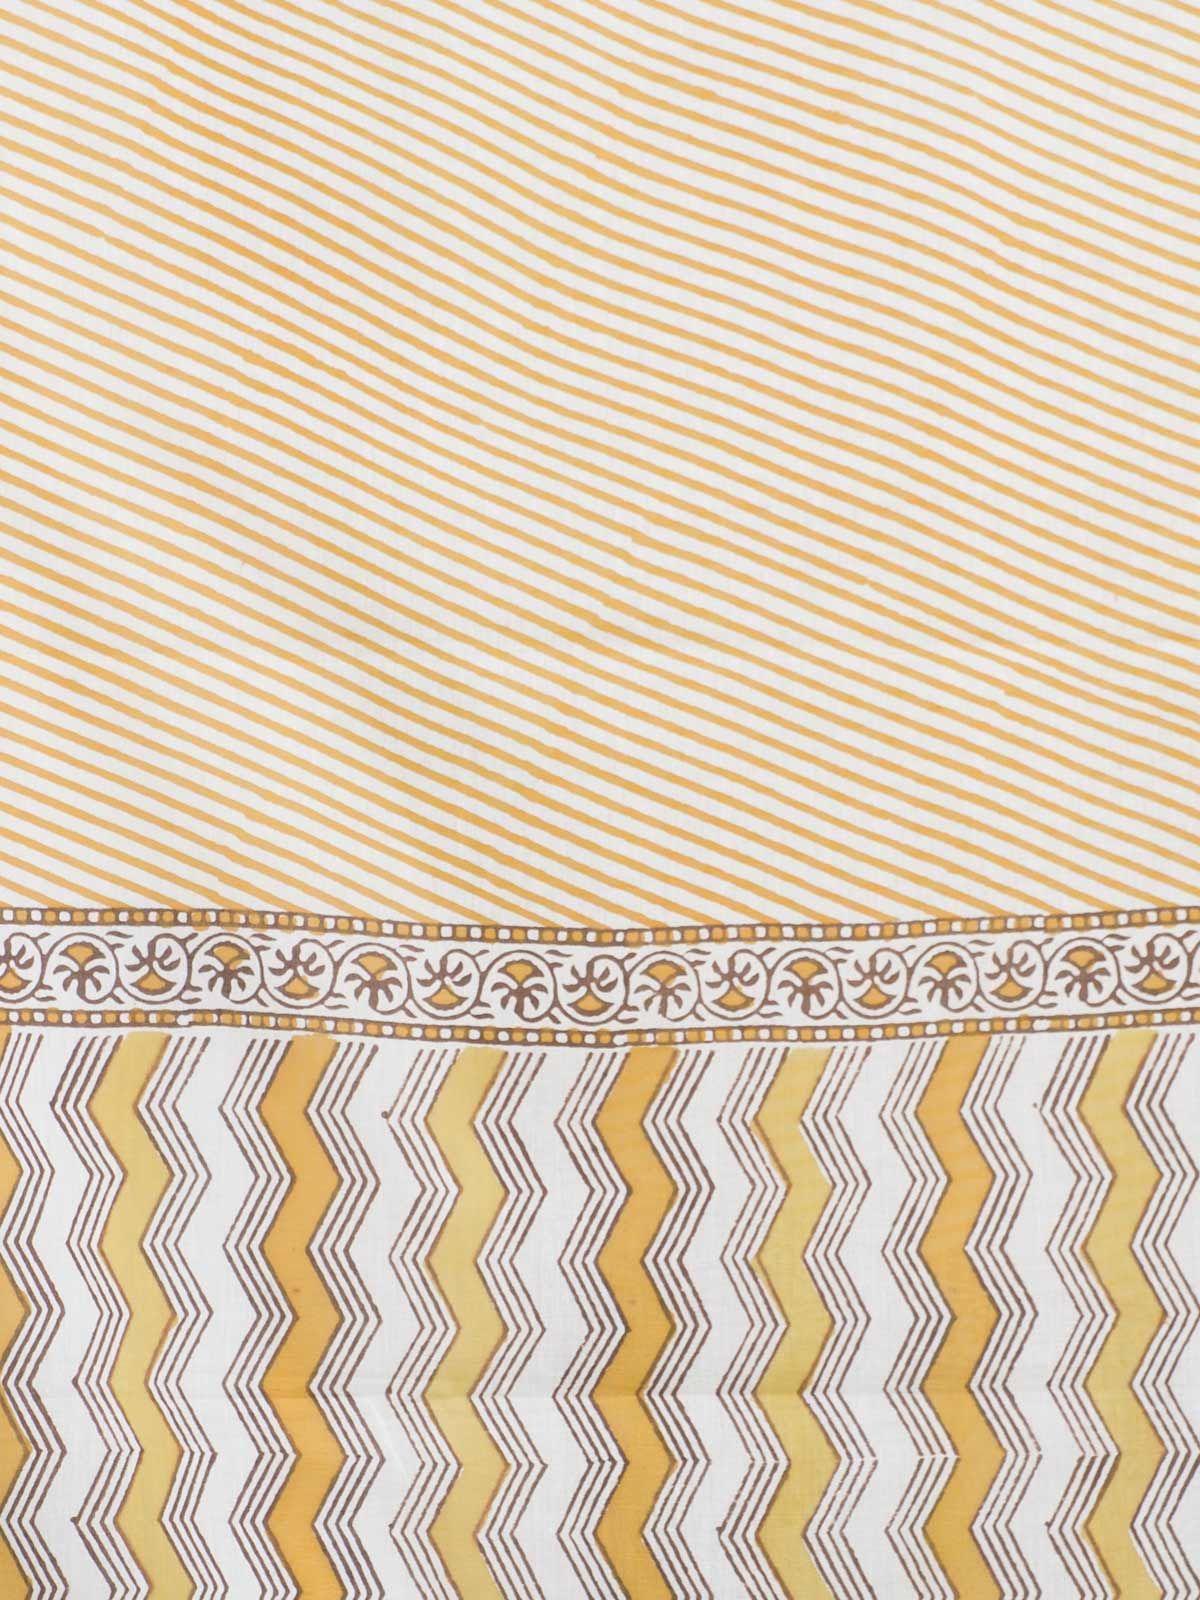 Yellow stripes  block printed cotton dupatta